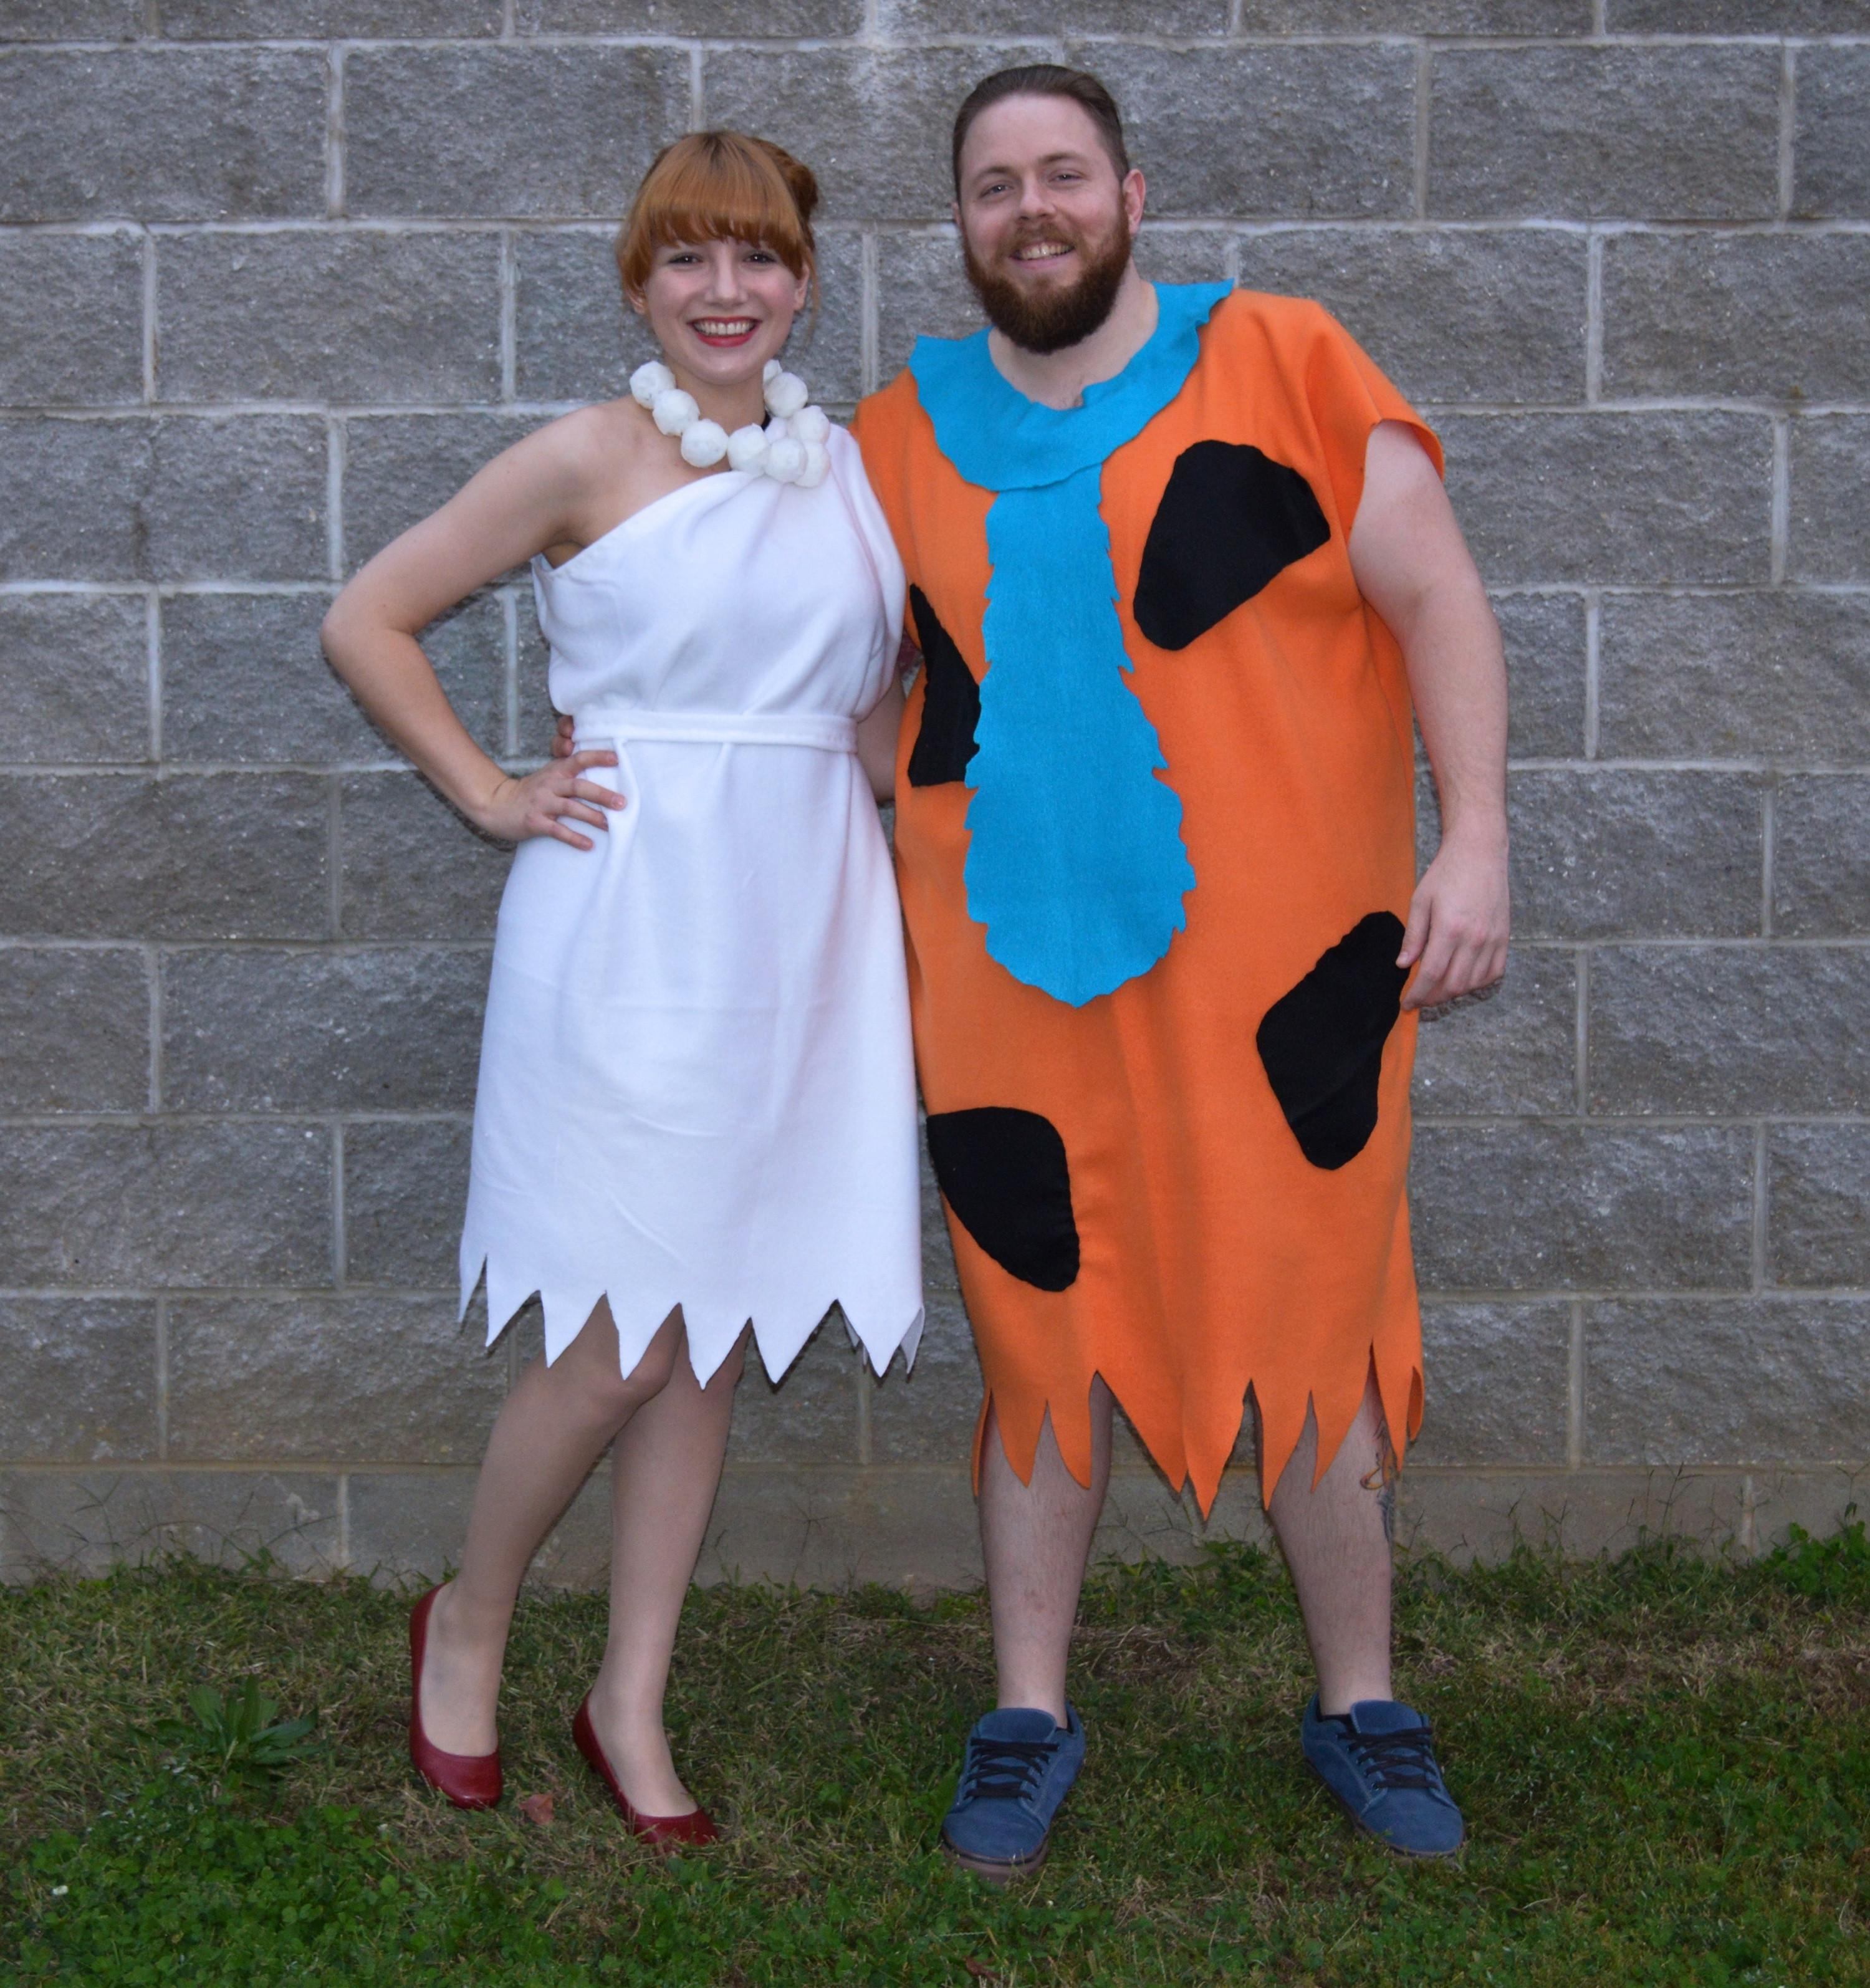 Flintstones Costumes DIY  Yabba dabba BOO – Oh Julia Ann